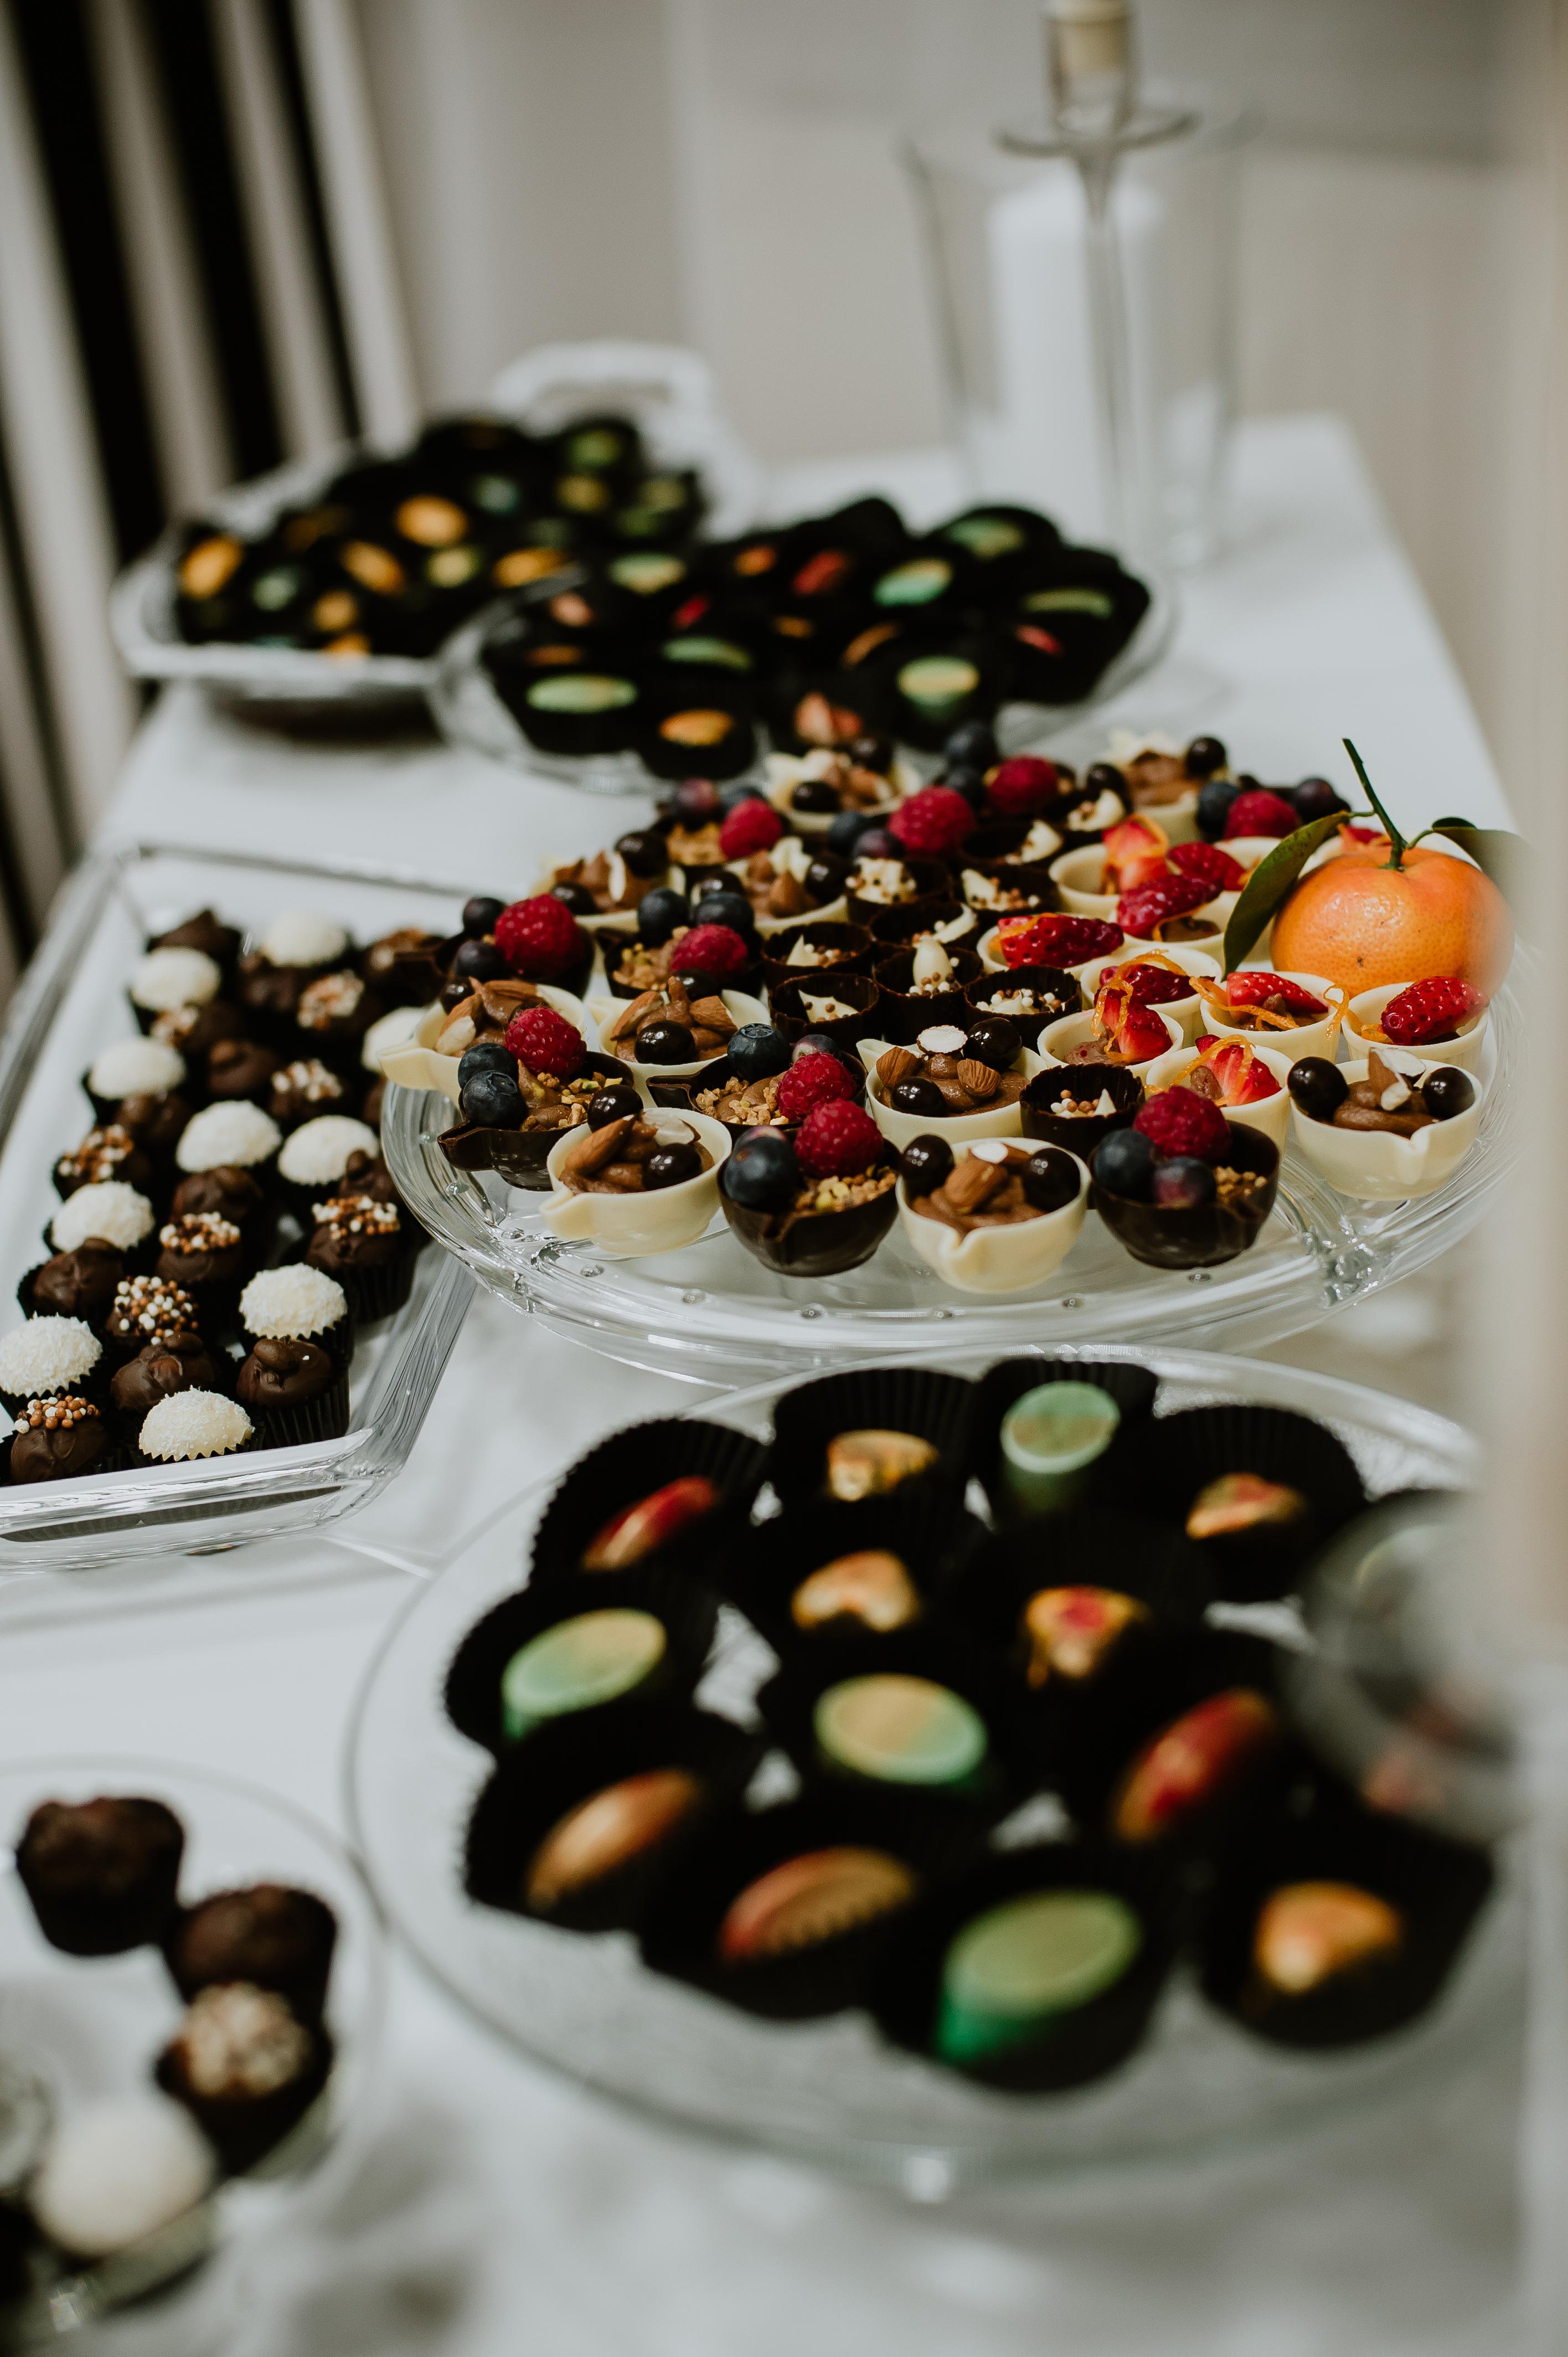 cadouri corporate, cadouri dulci, bomboane pictate, ciocolata, chocobar